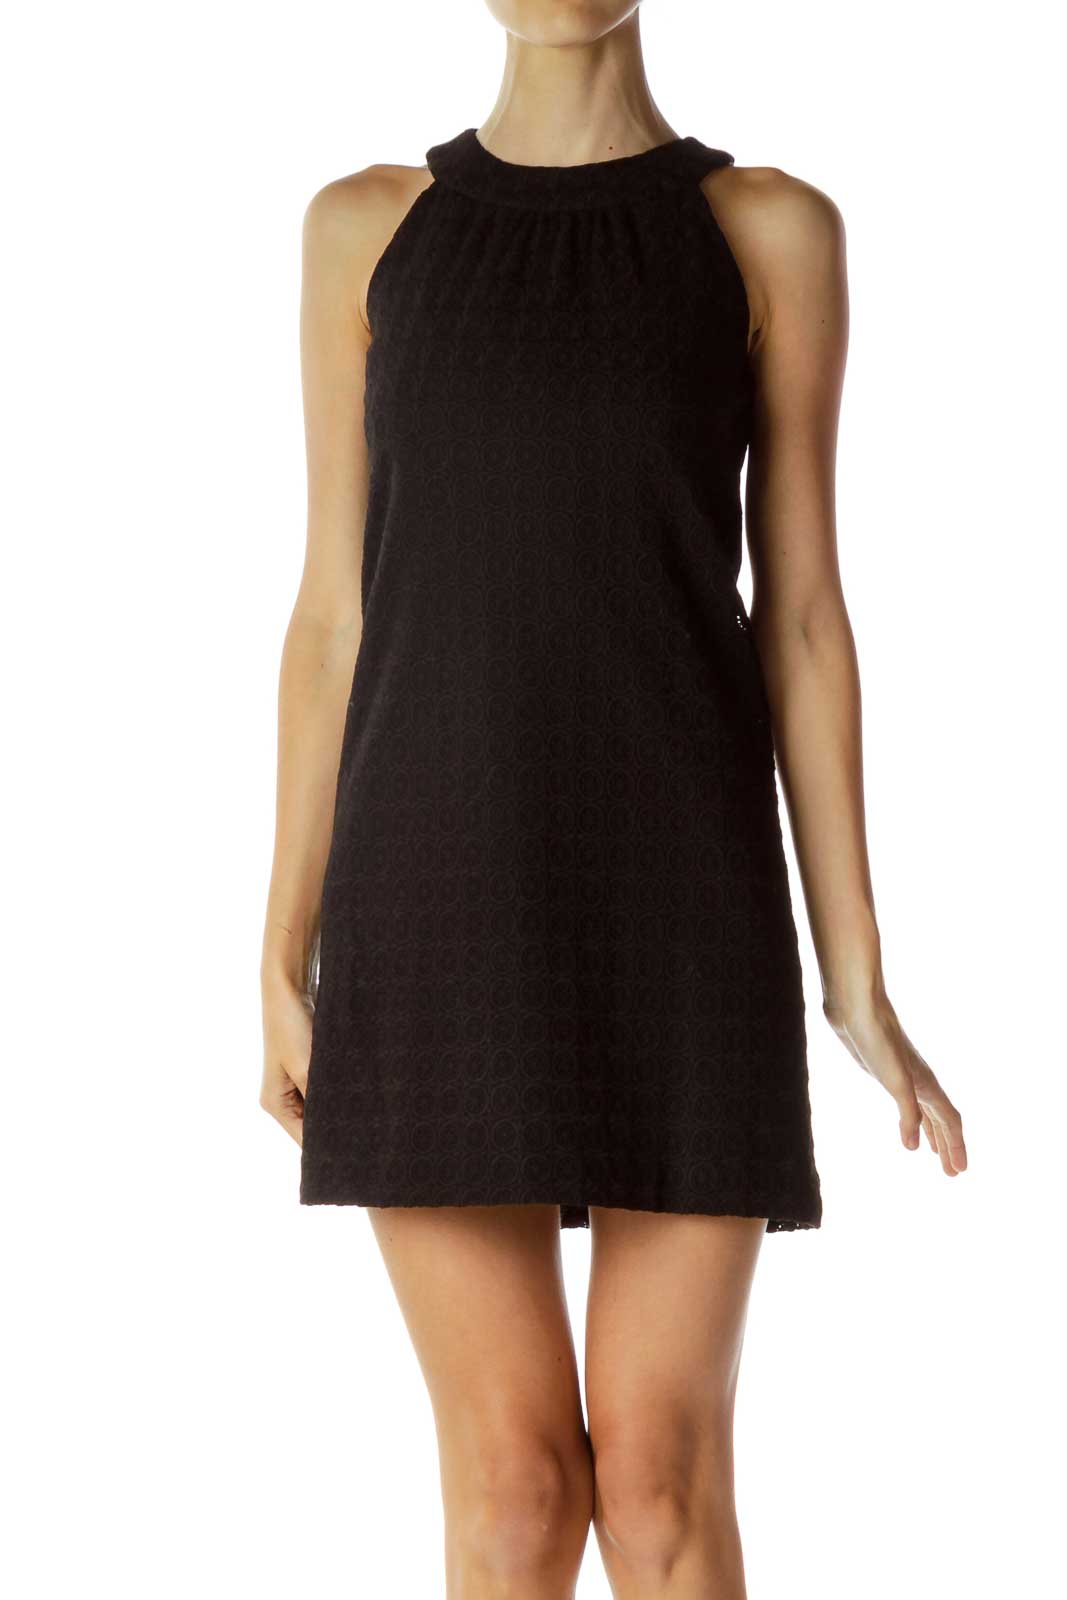 Black Halter Embossed Shift Dress Front